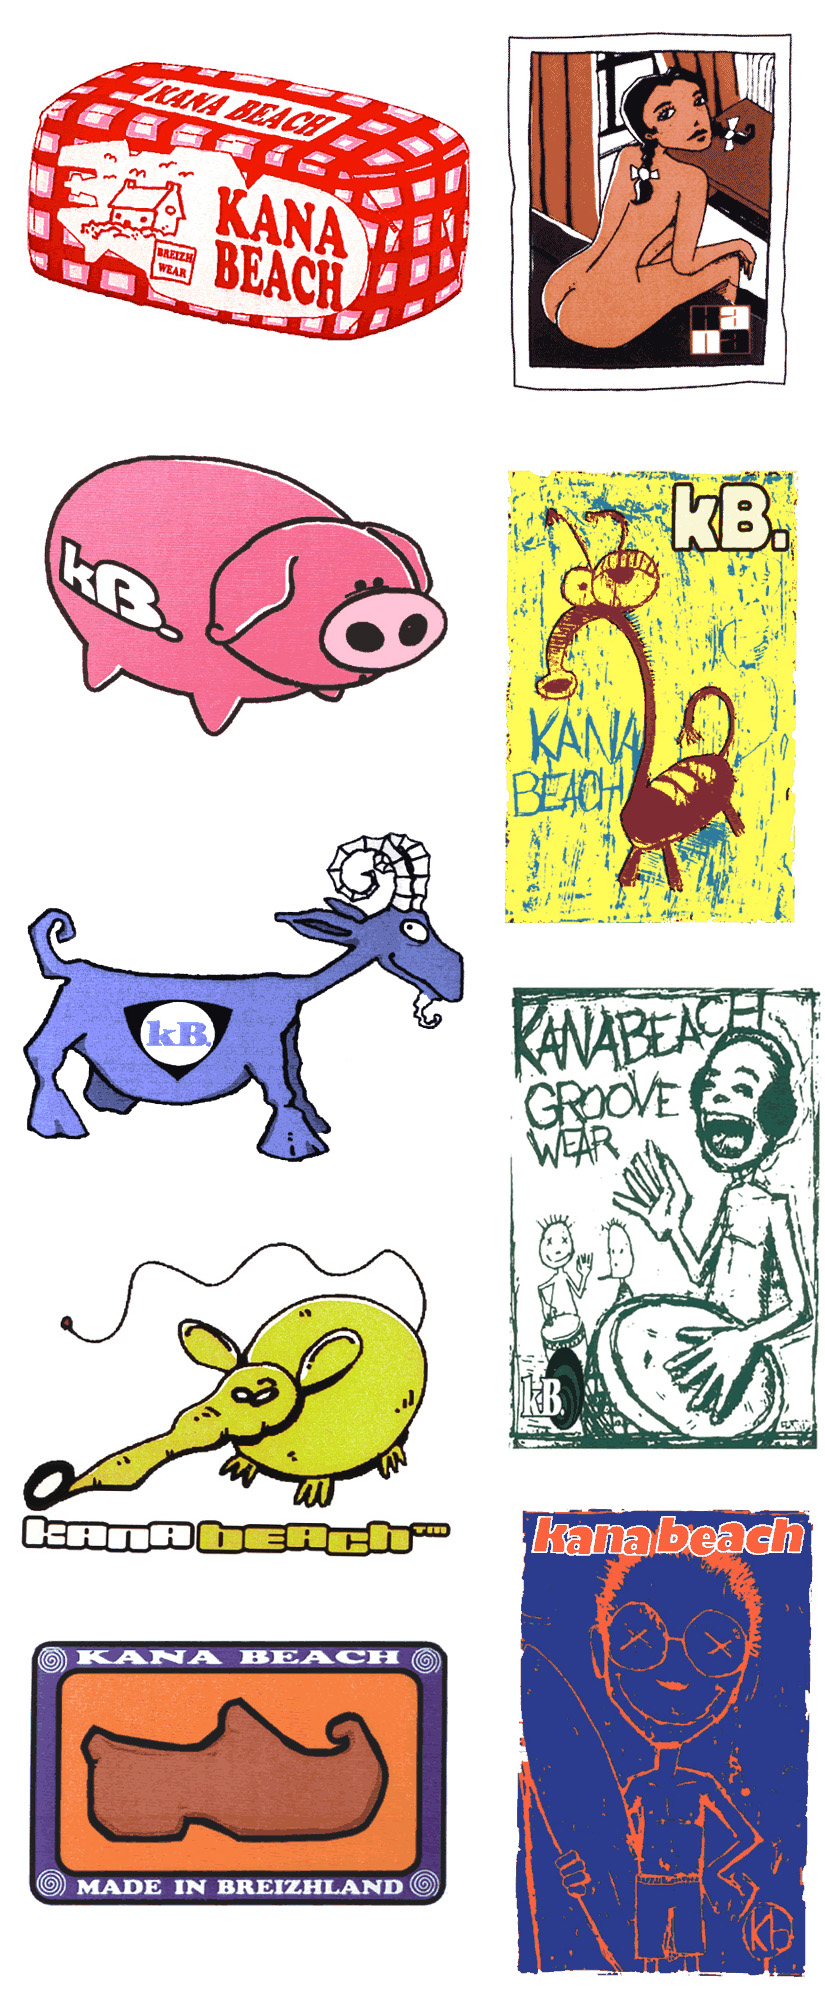 kanabeach-illustration-franckie-alarcon-pate-henaff-beurre-breton